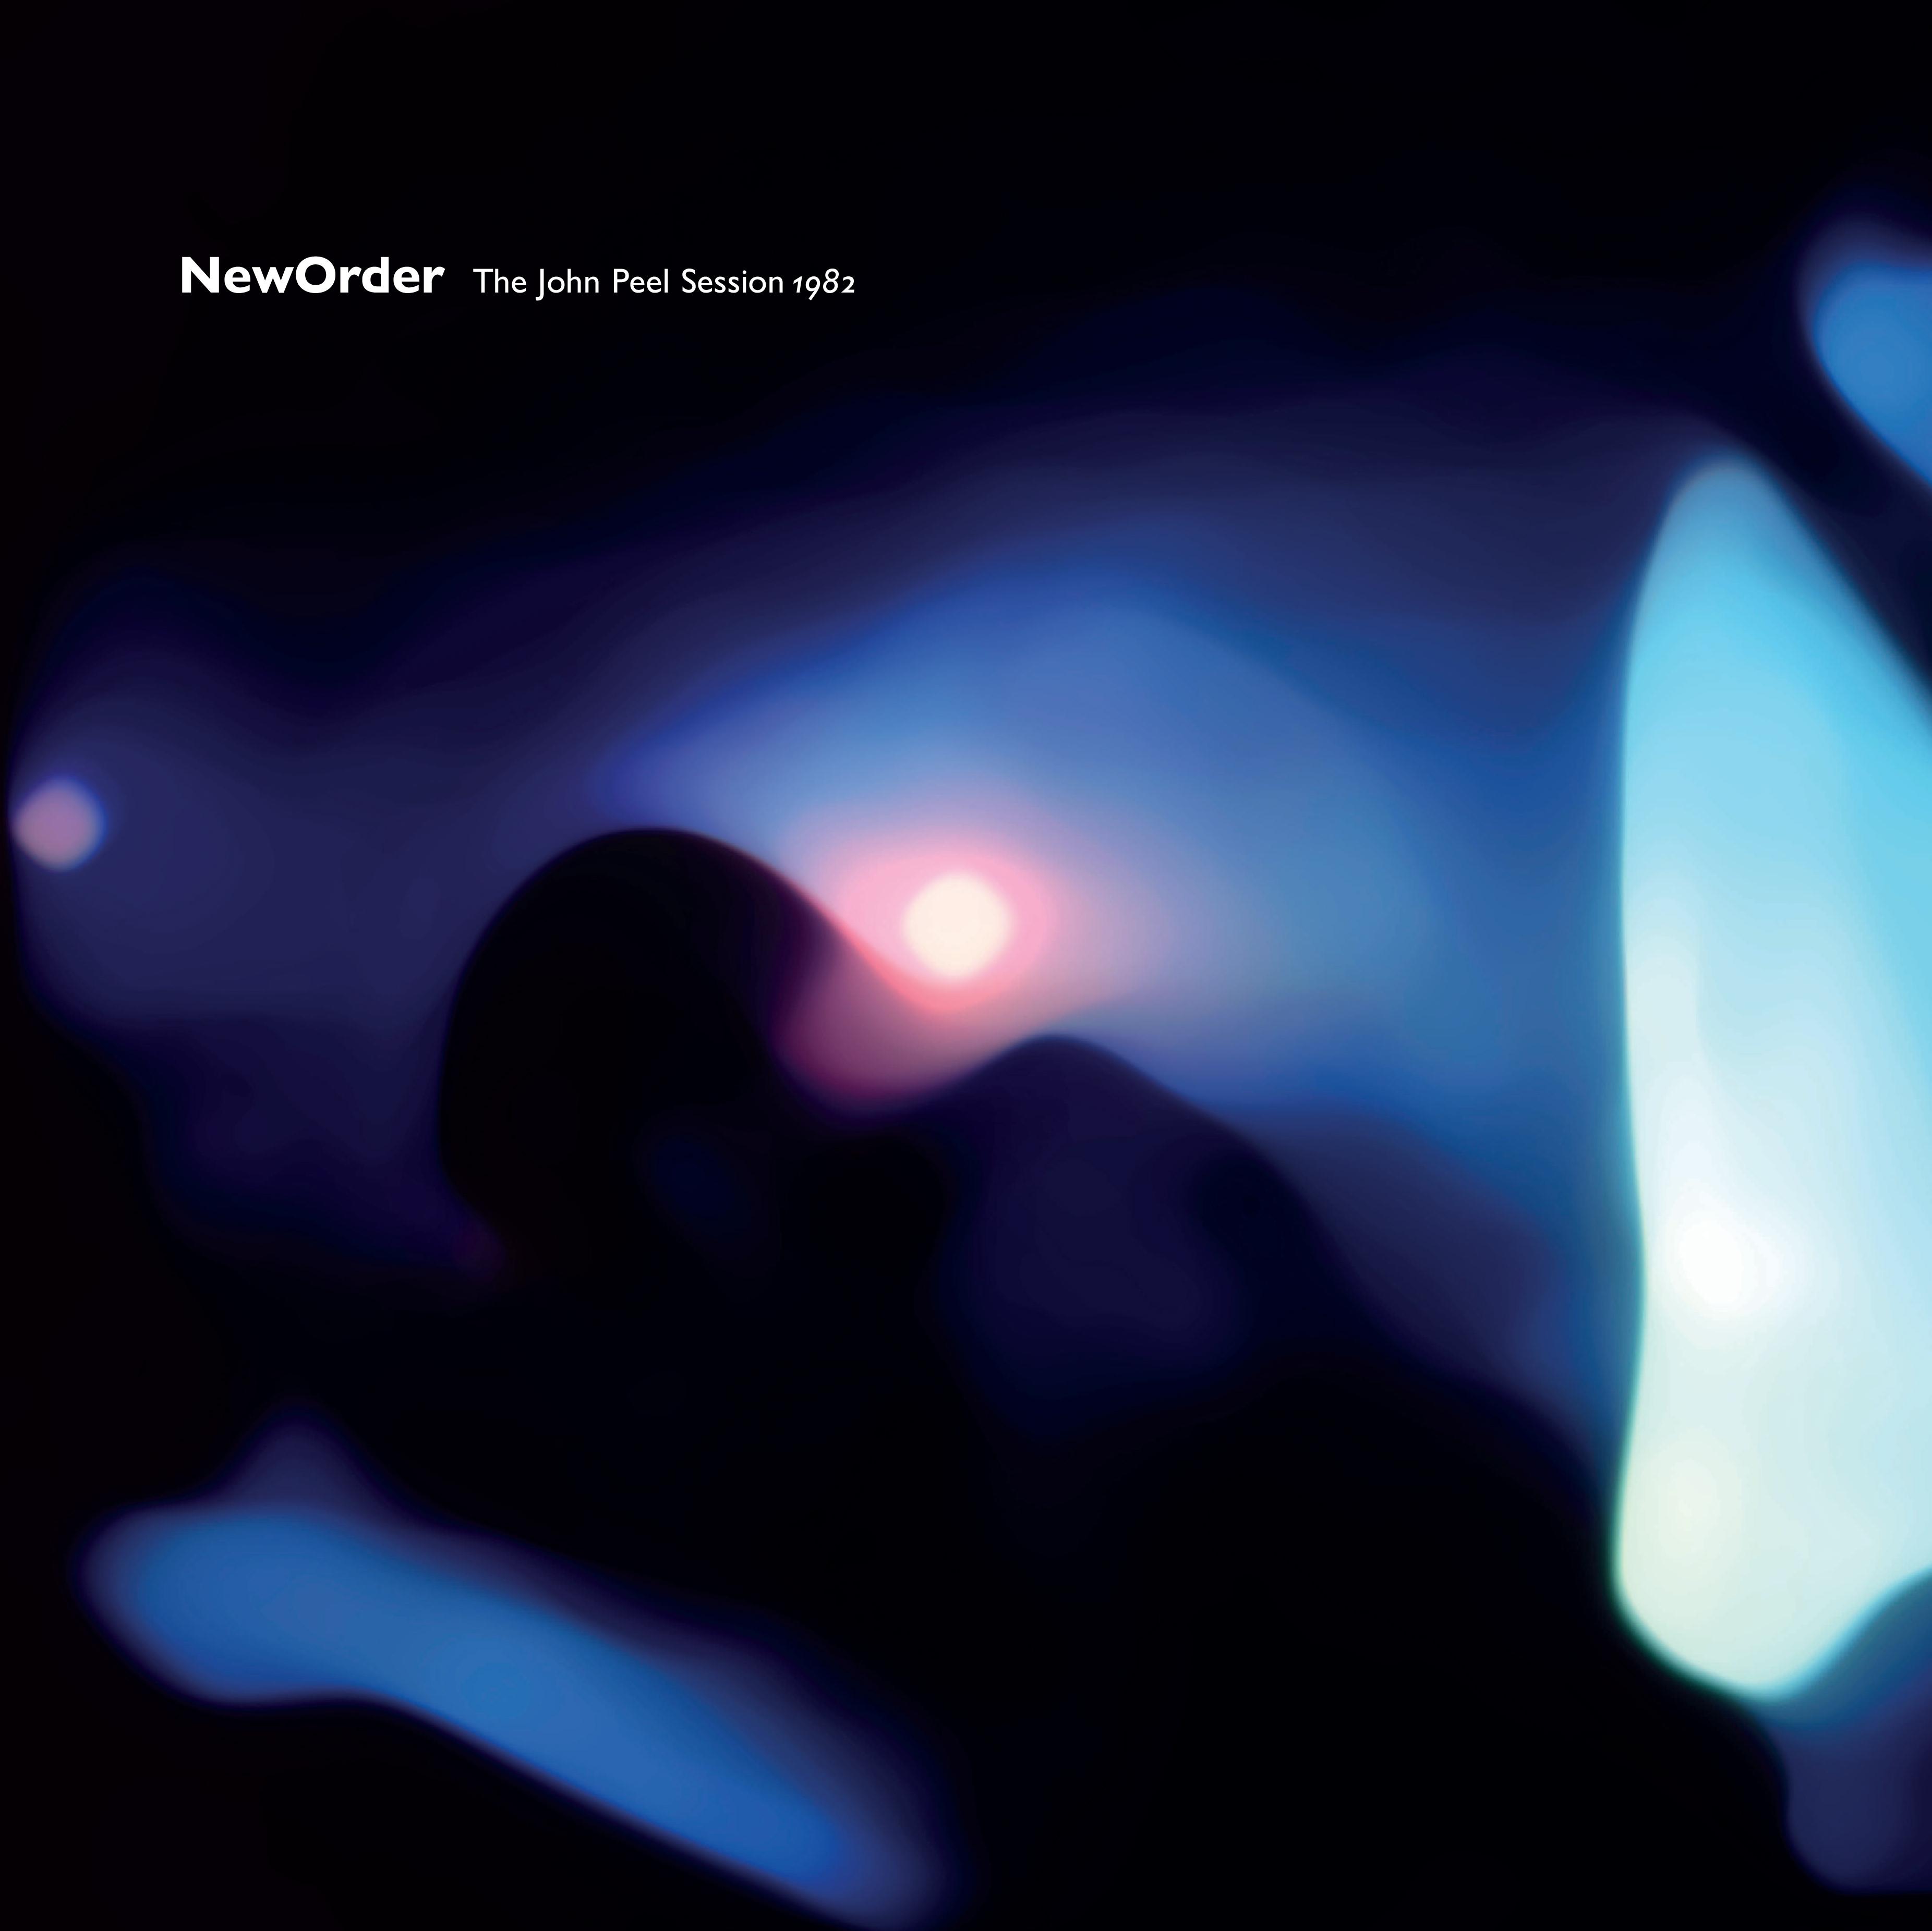 New Order - The John Peel Session 1982